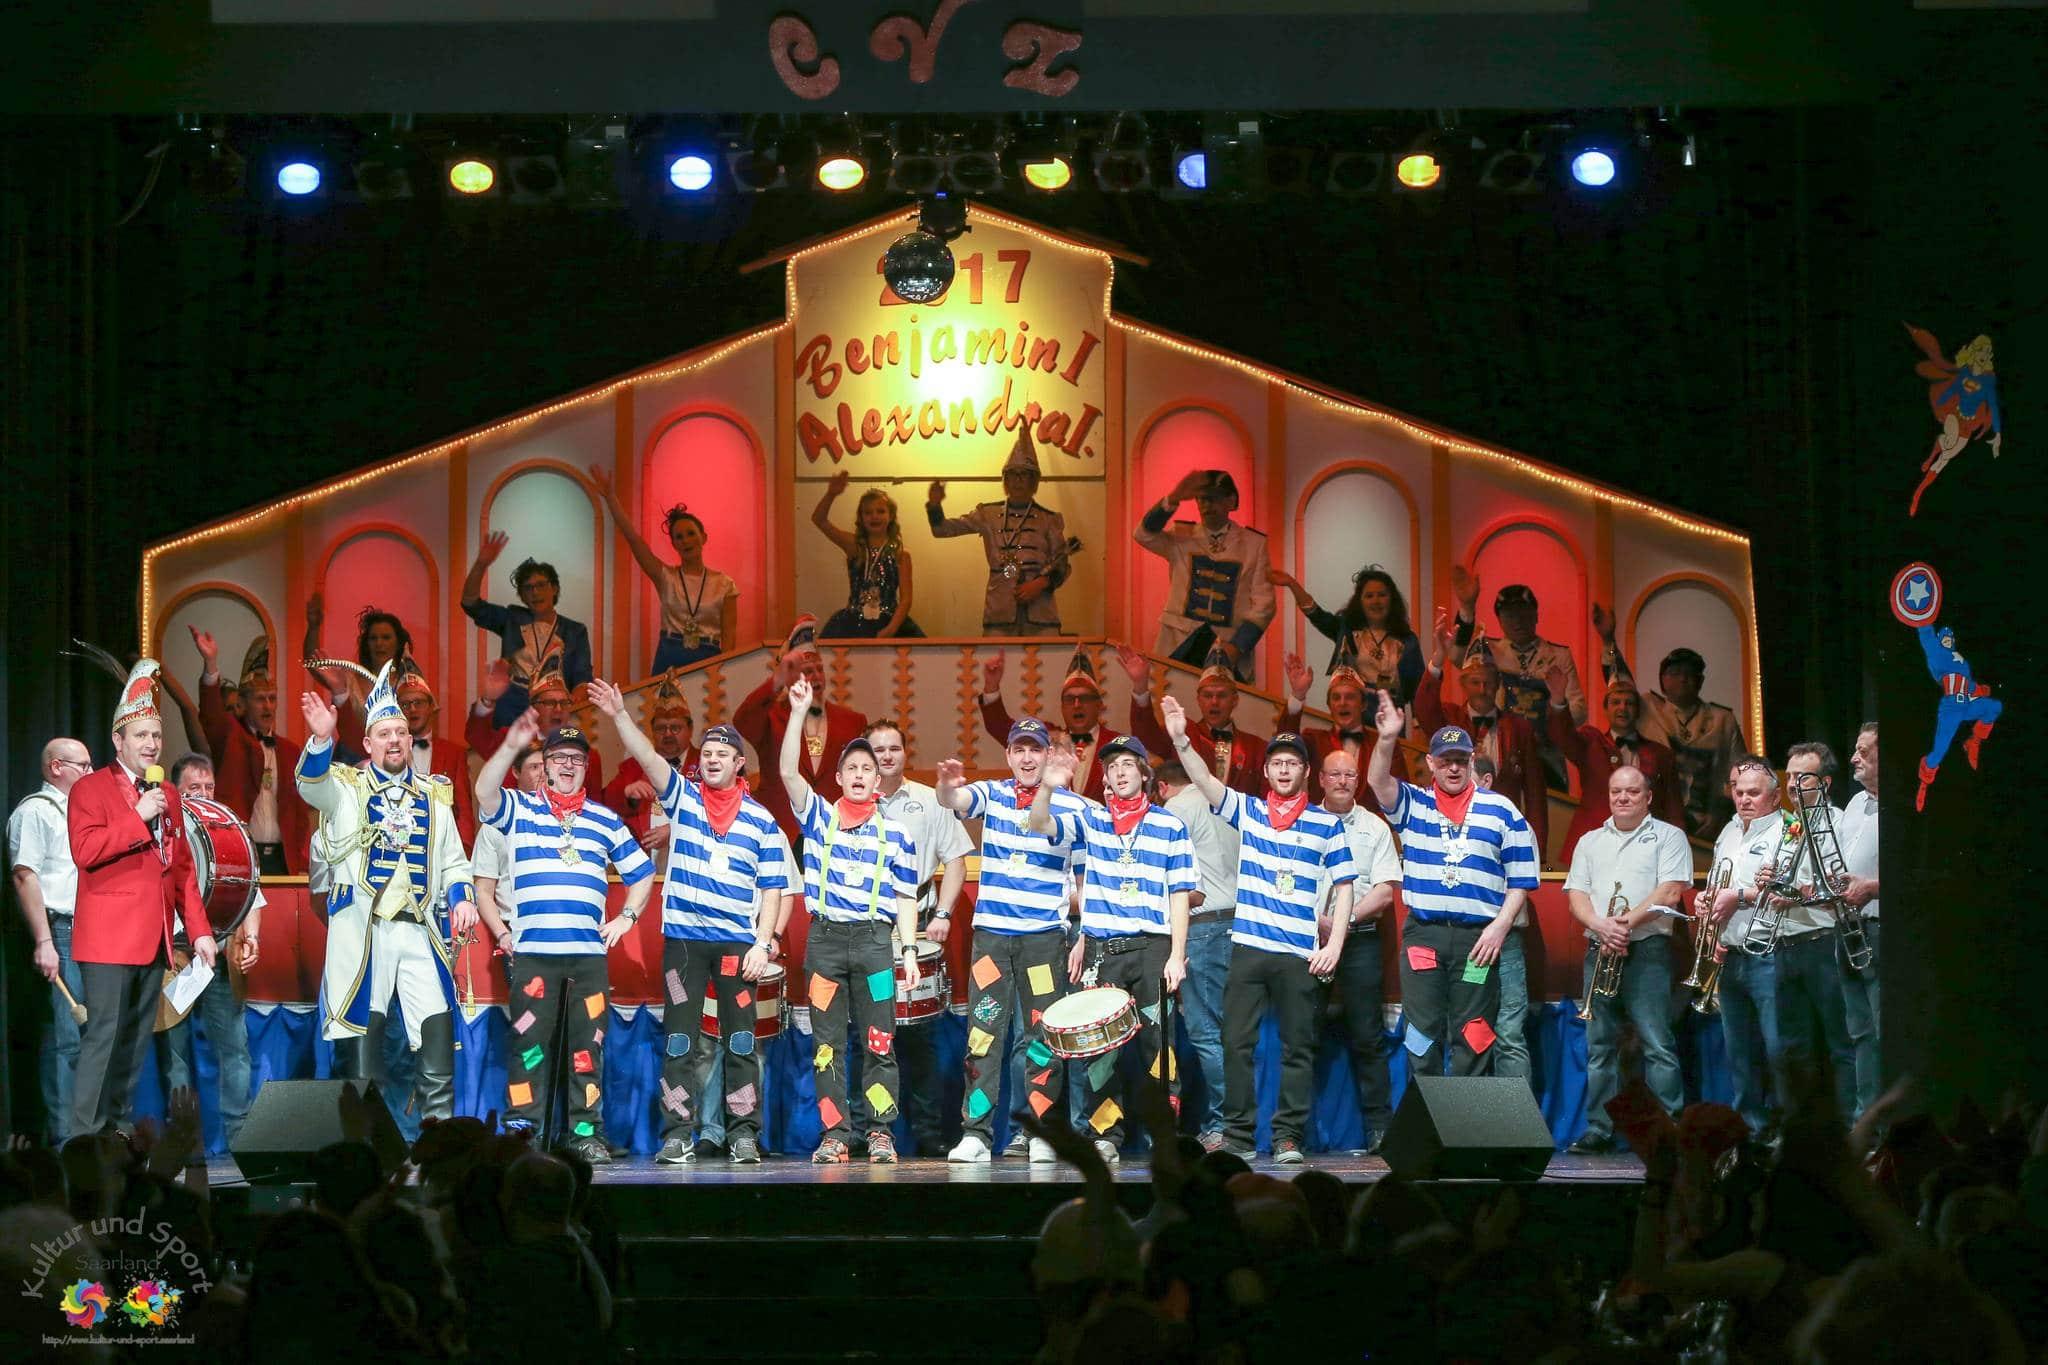 1. Kostümkappensitzung des Carneval Verein Lebach am 04.02.2017